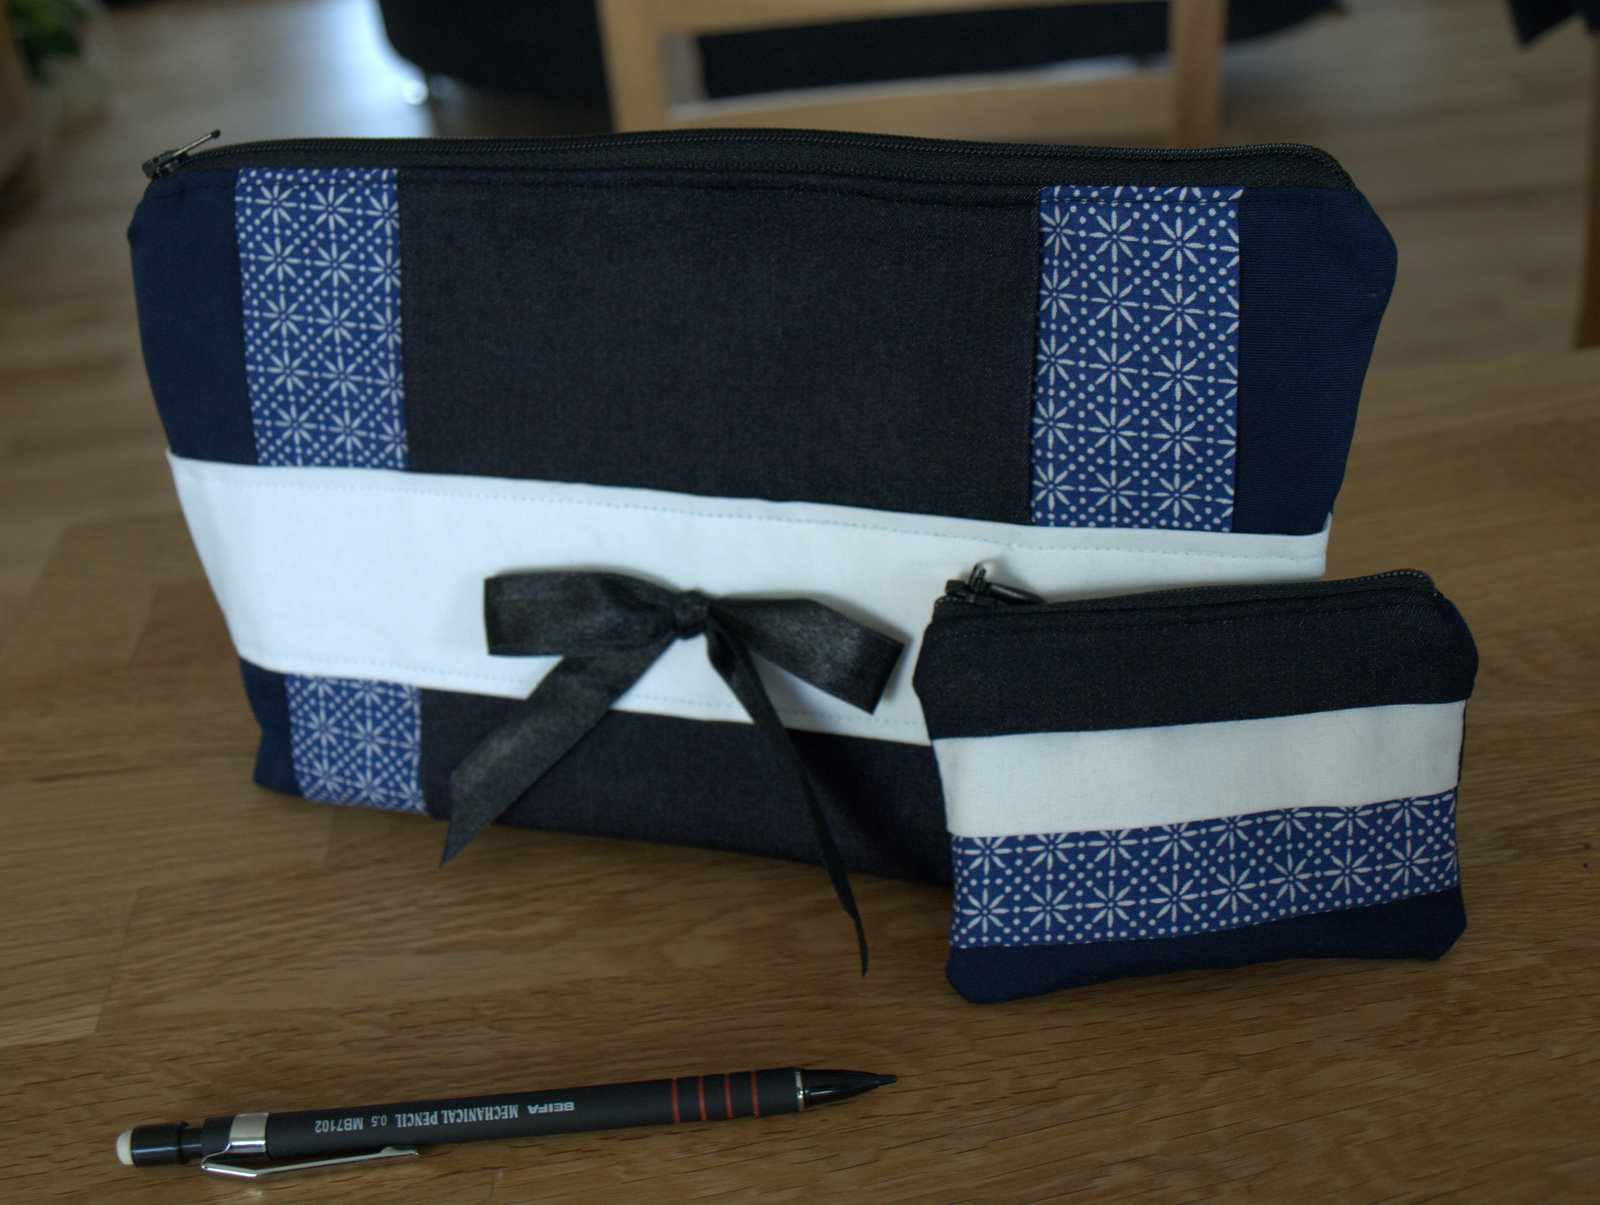 Min første taske på bestilling